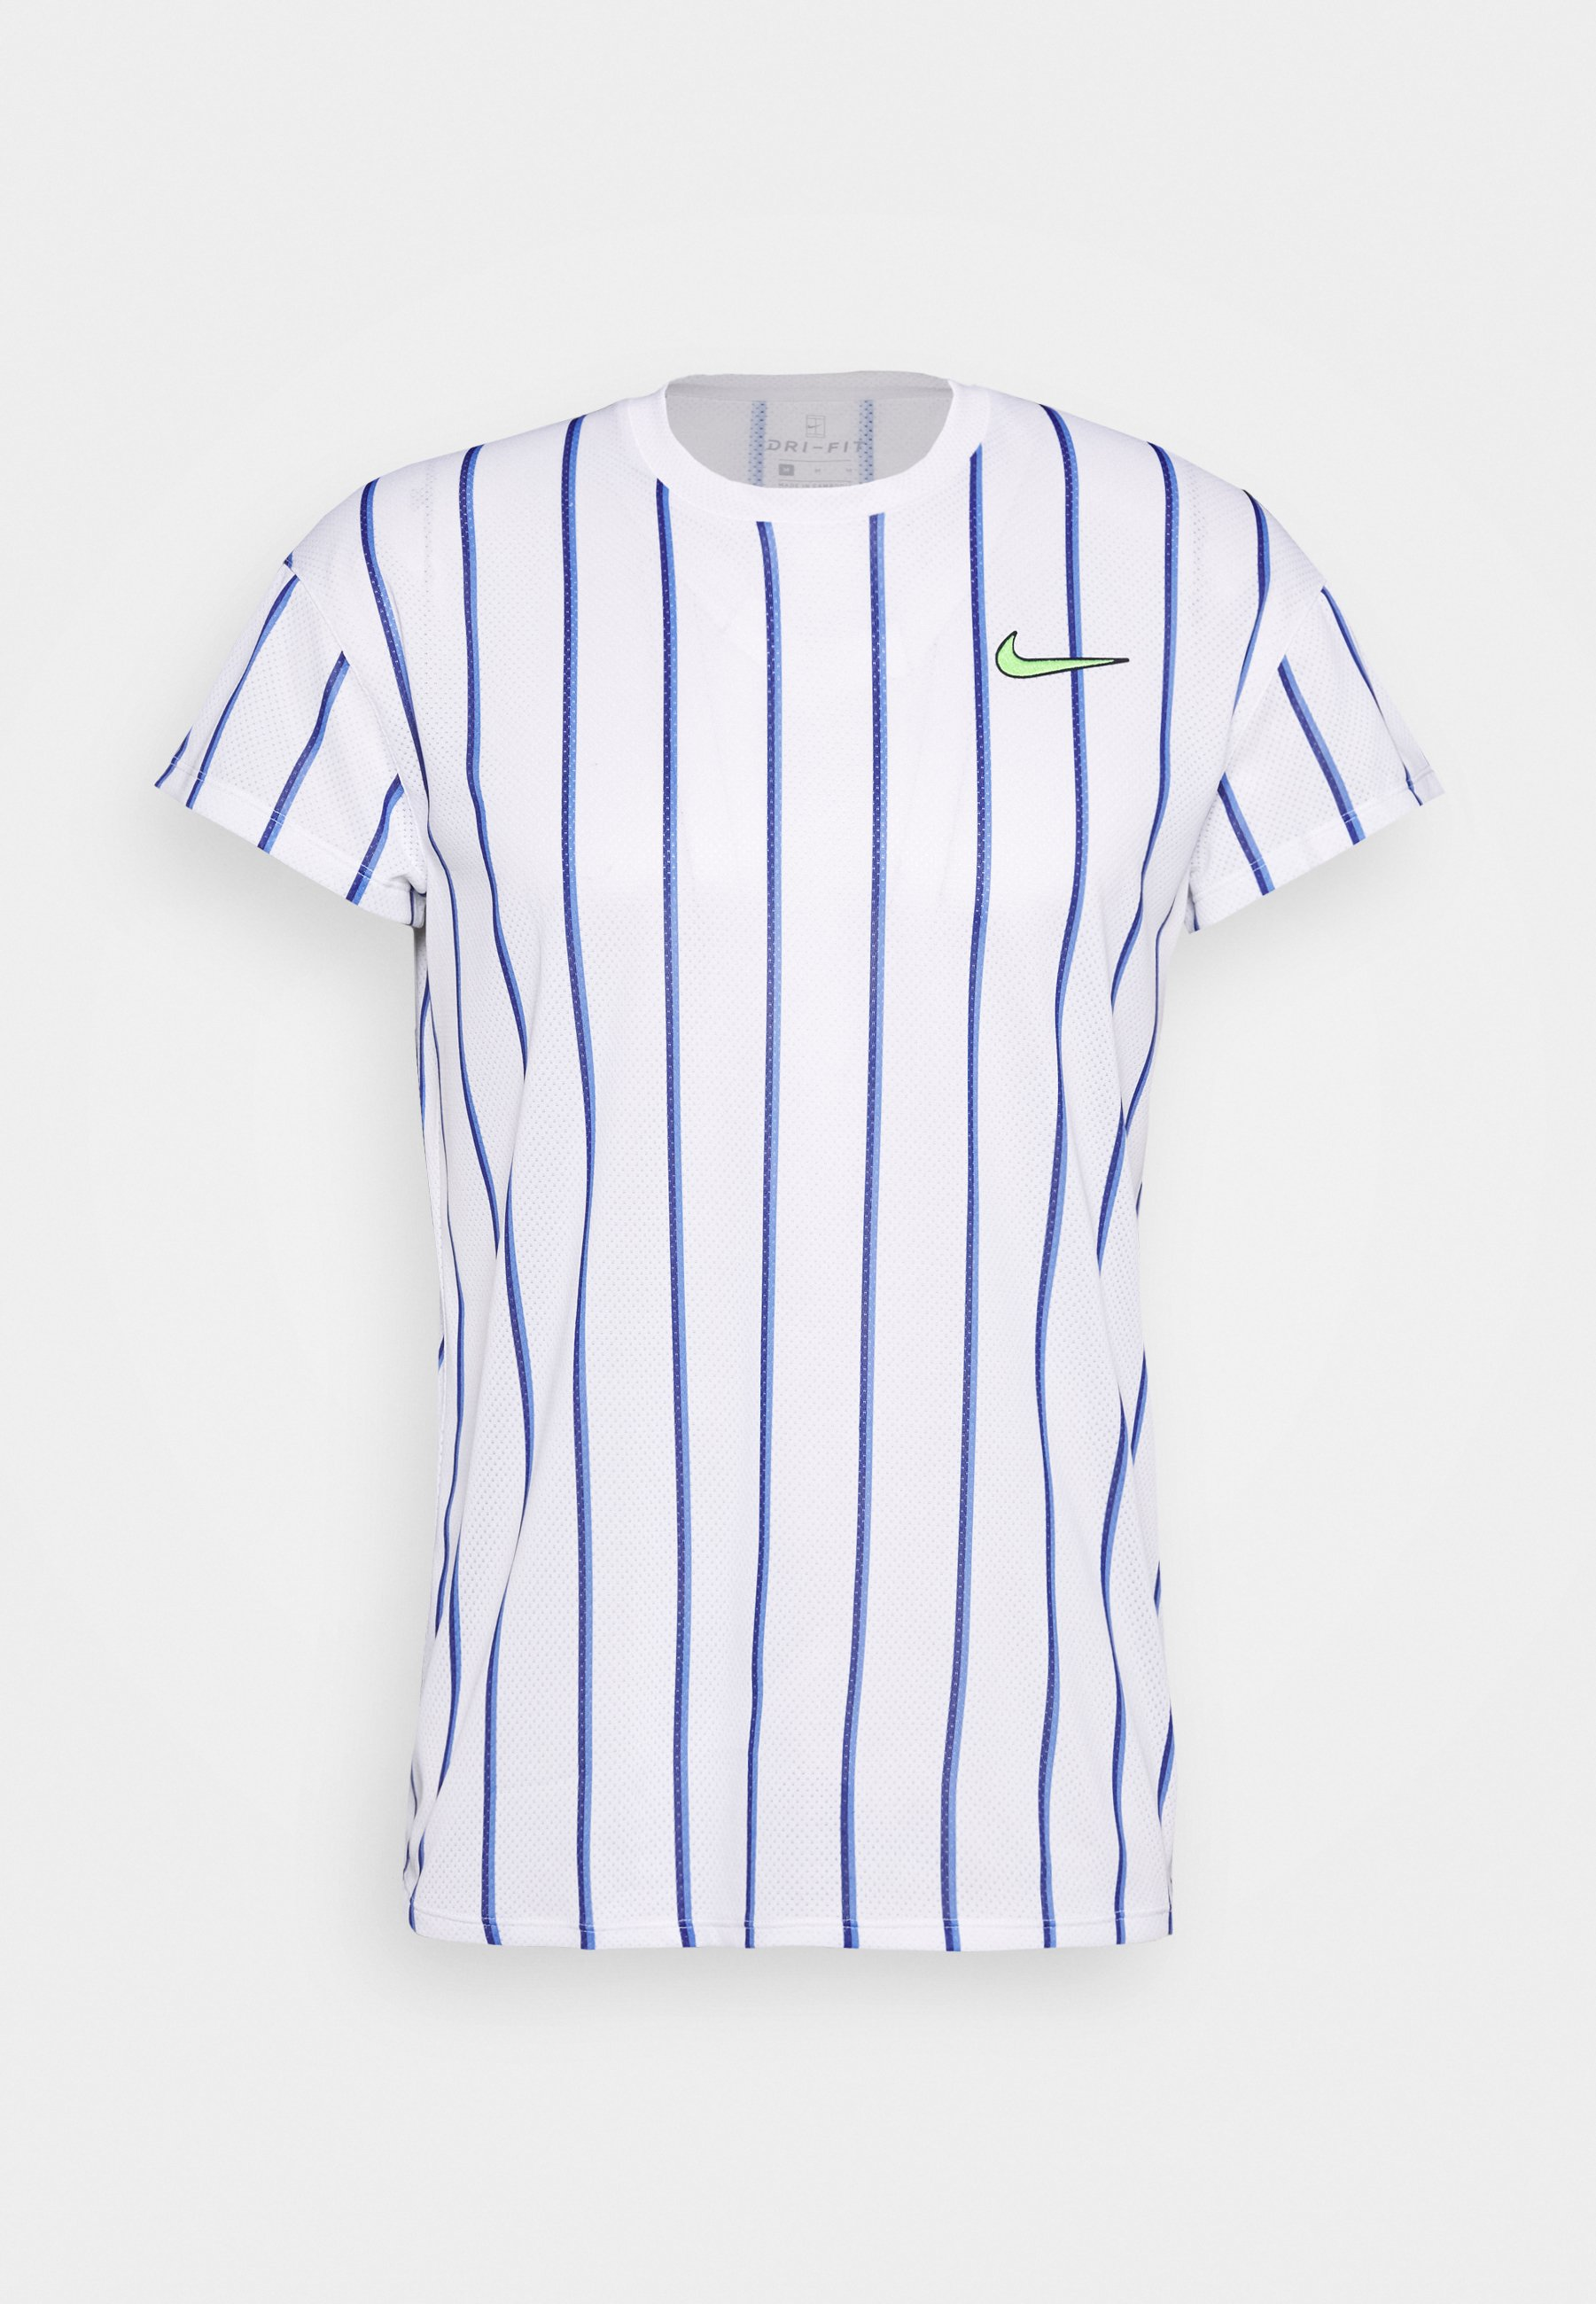 Nike Performance SLAM T shirt imprimé whiteghost green